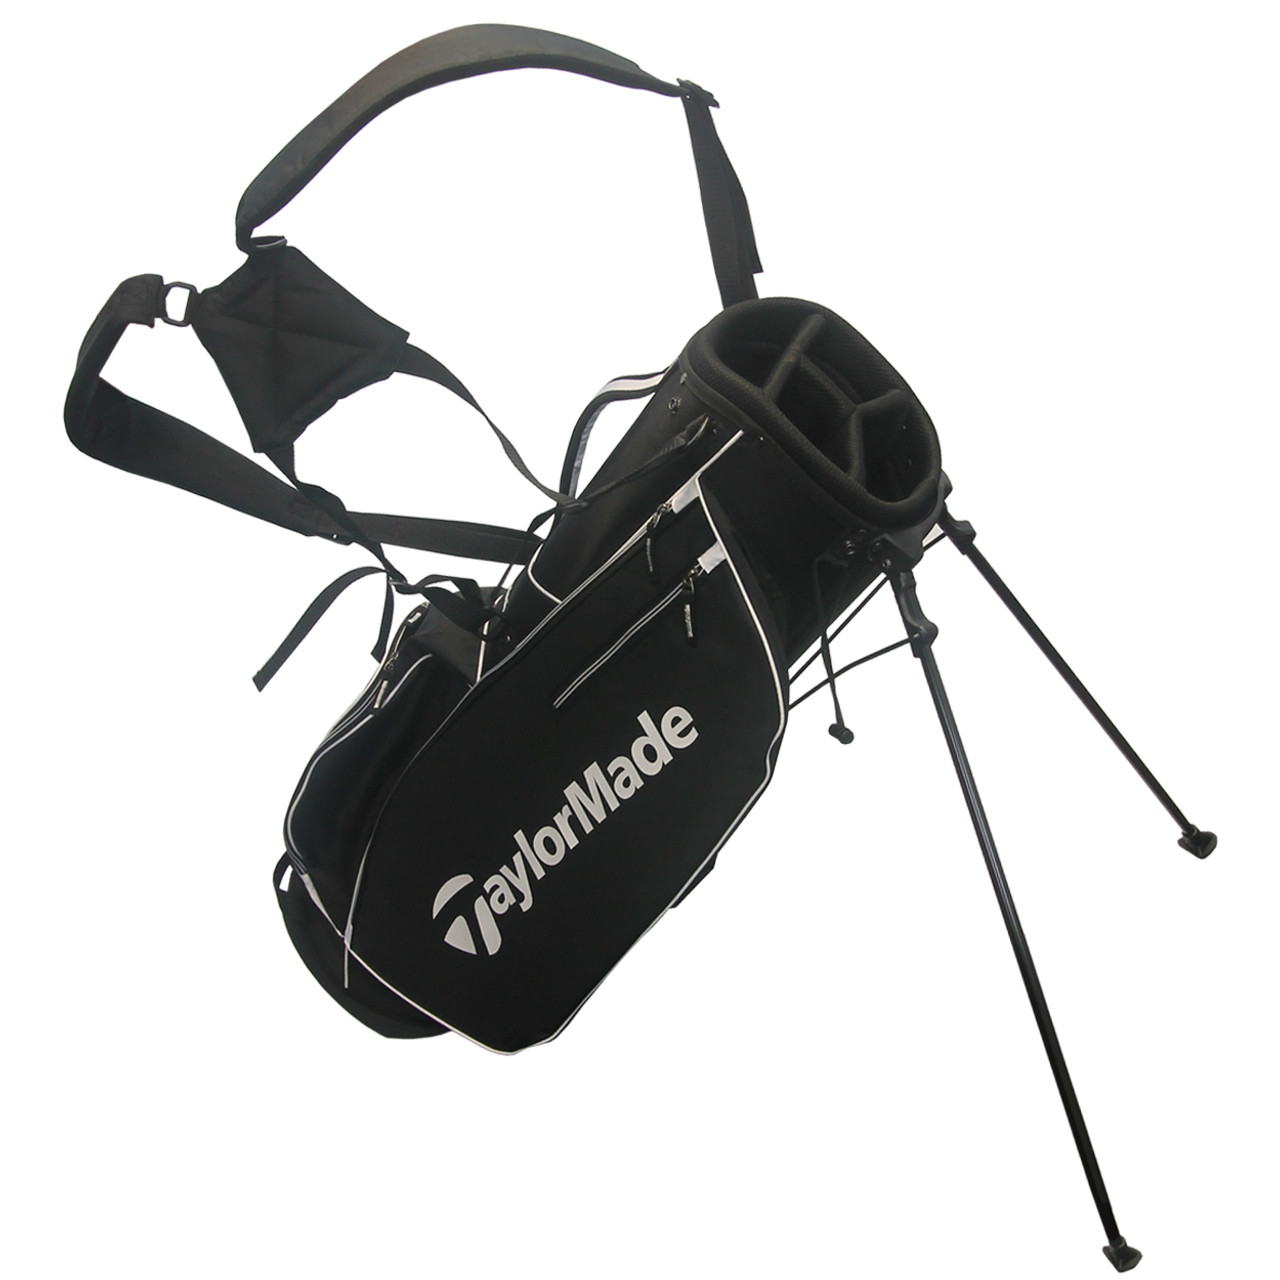 Taylormade Golf Bag >> Taylormade Golf Stand Bag 5 0 Golfetail Com